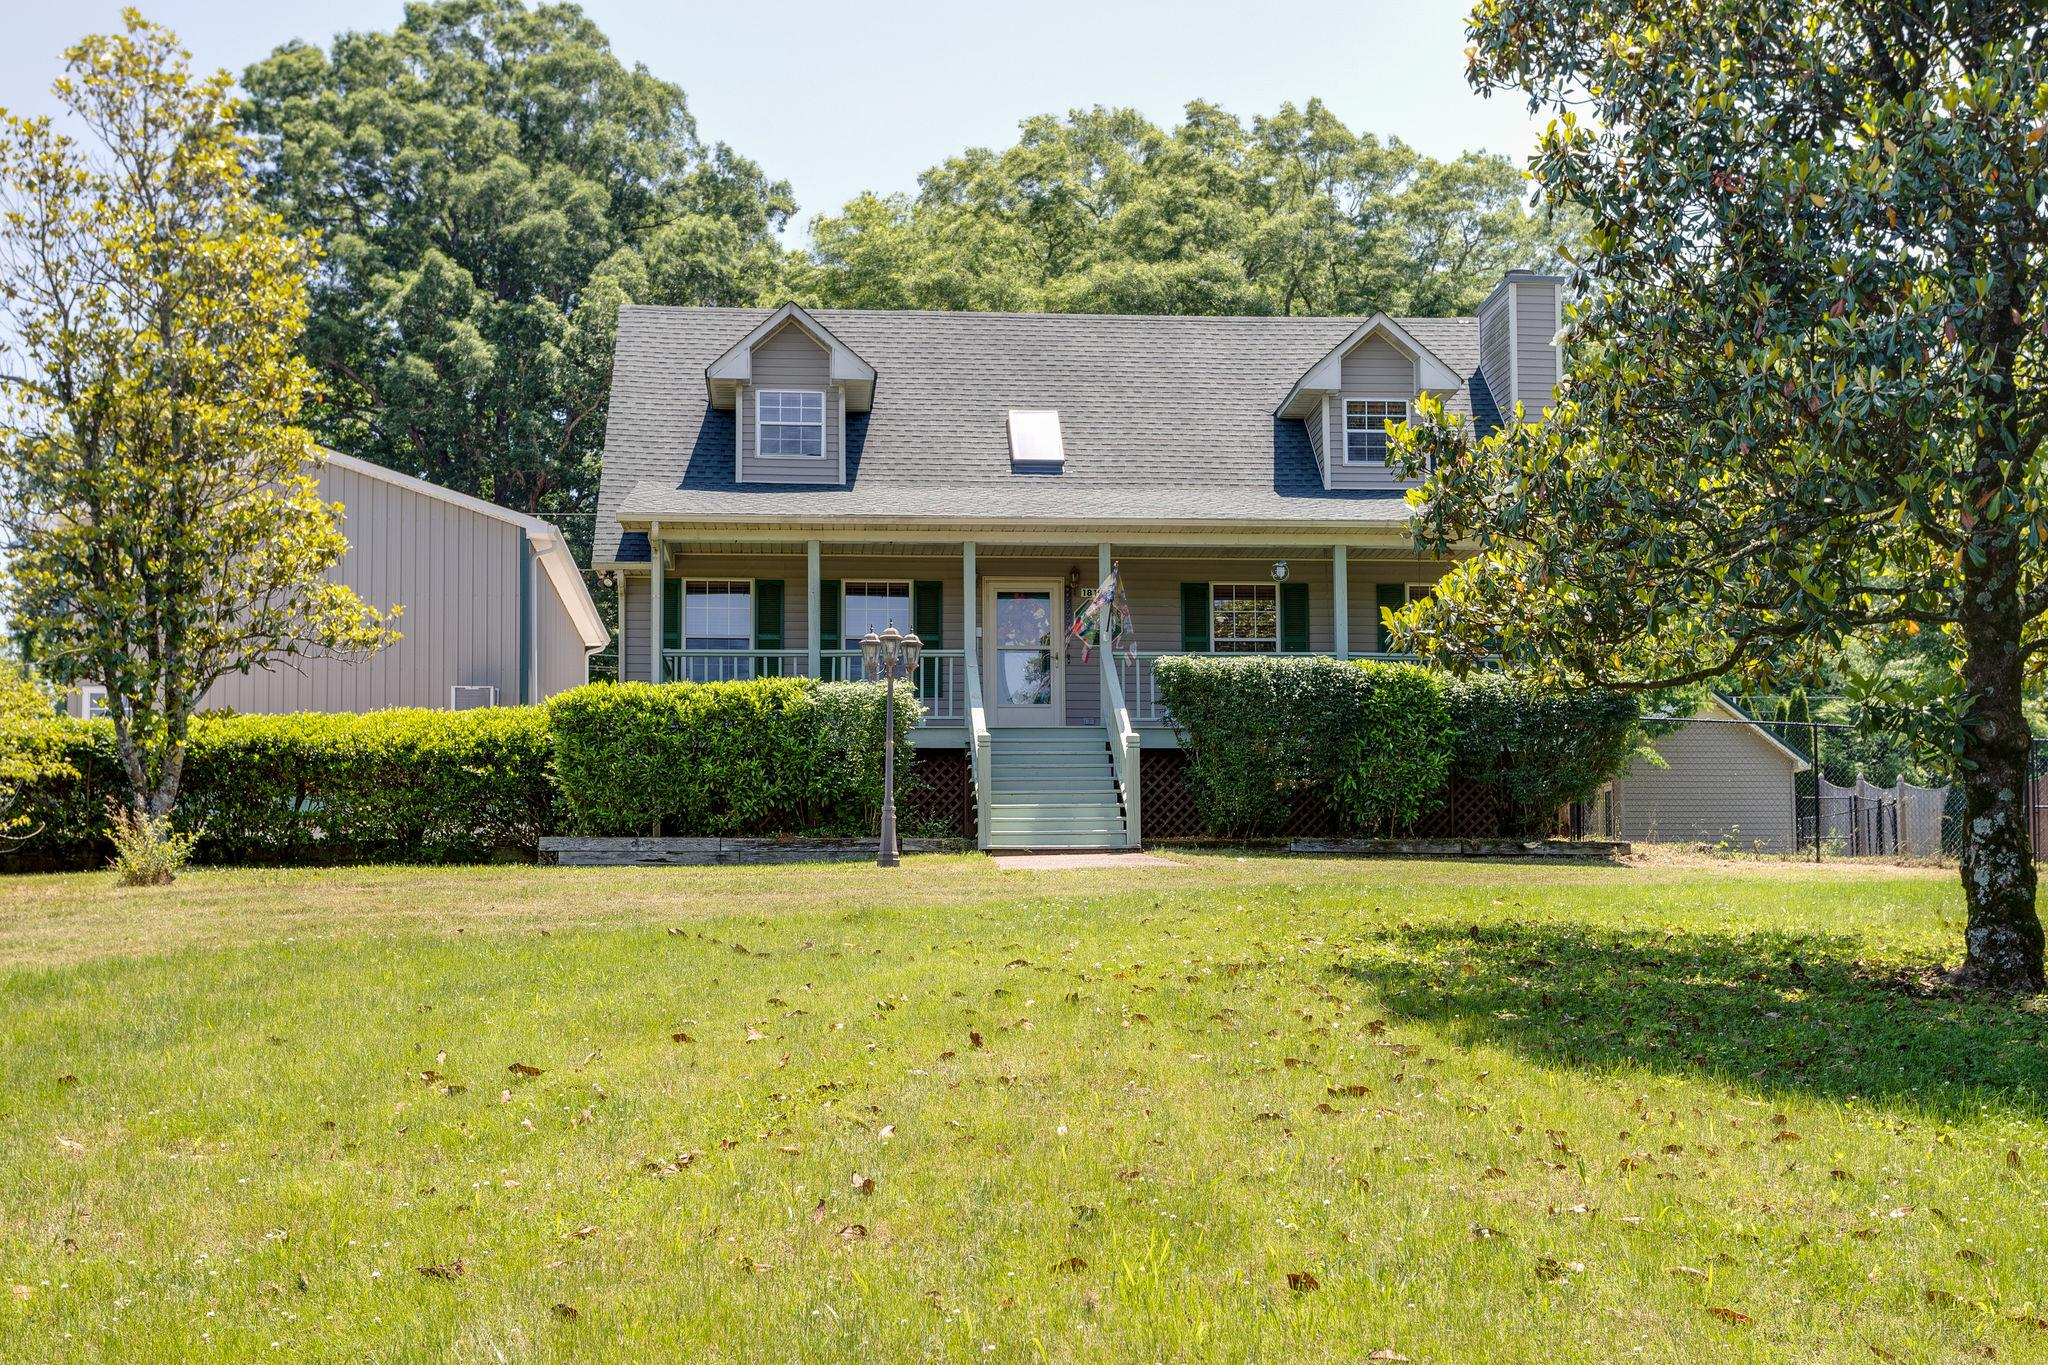 1819 Seavy Hight Rd, Columbia, TN 38401 - Columbia, TN real estate listing